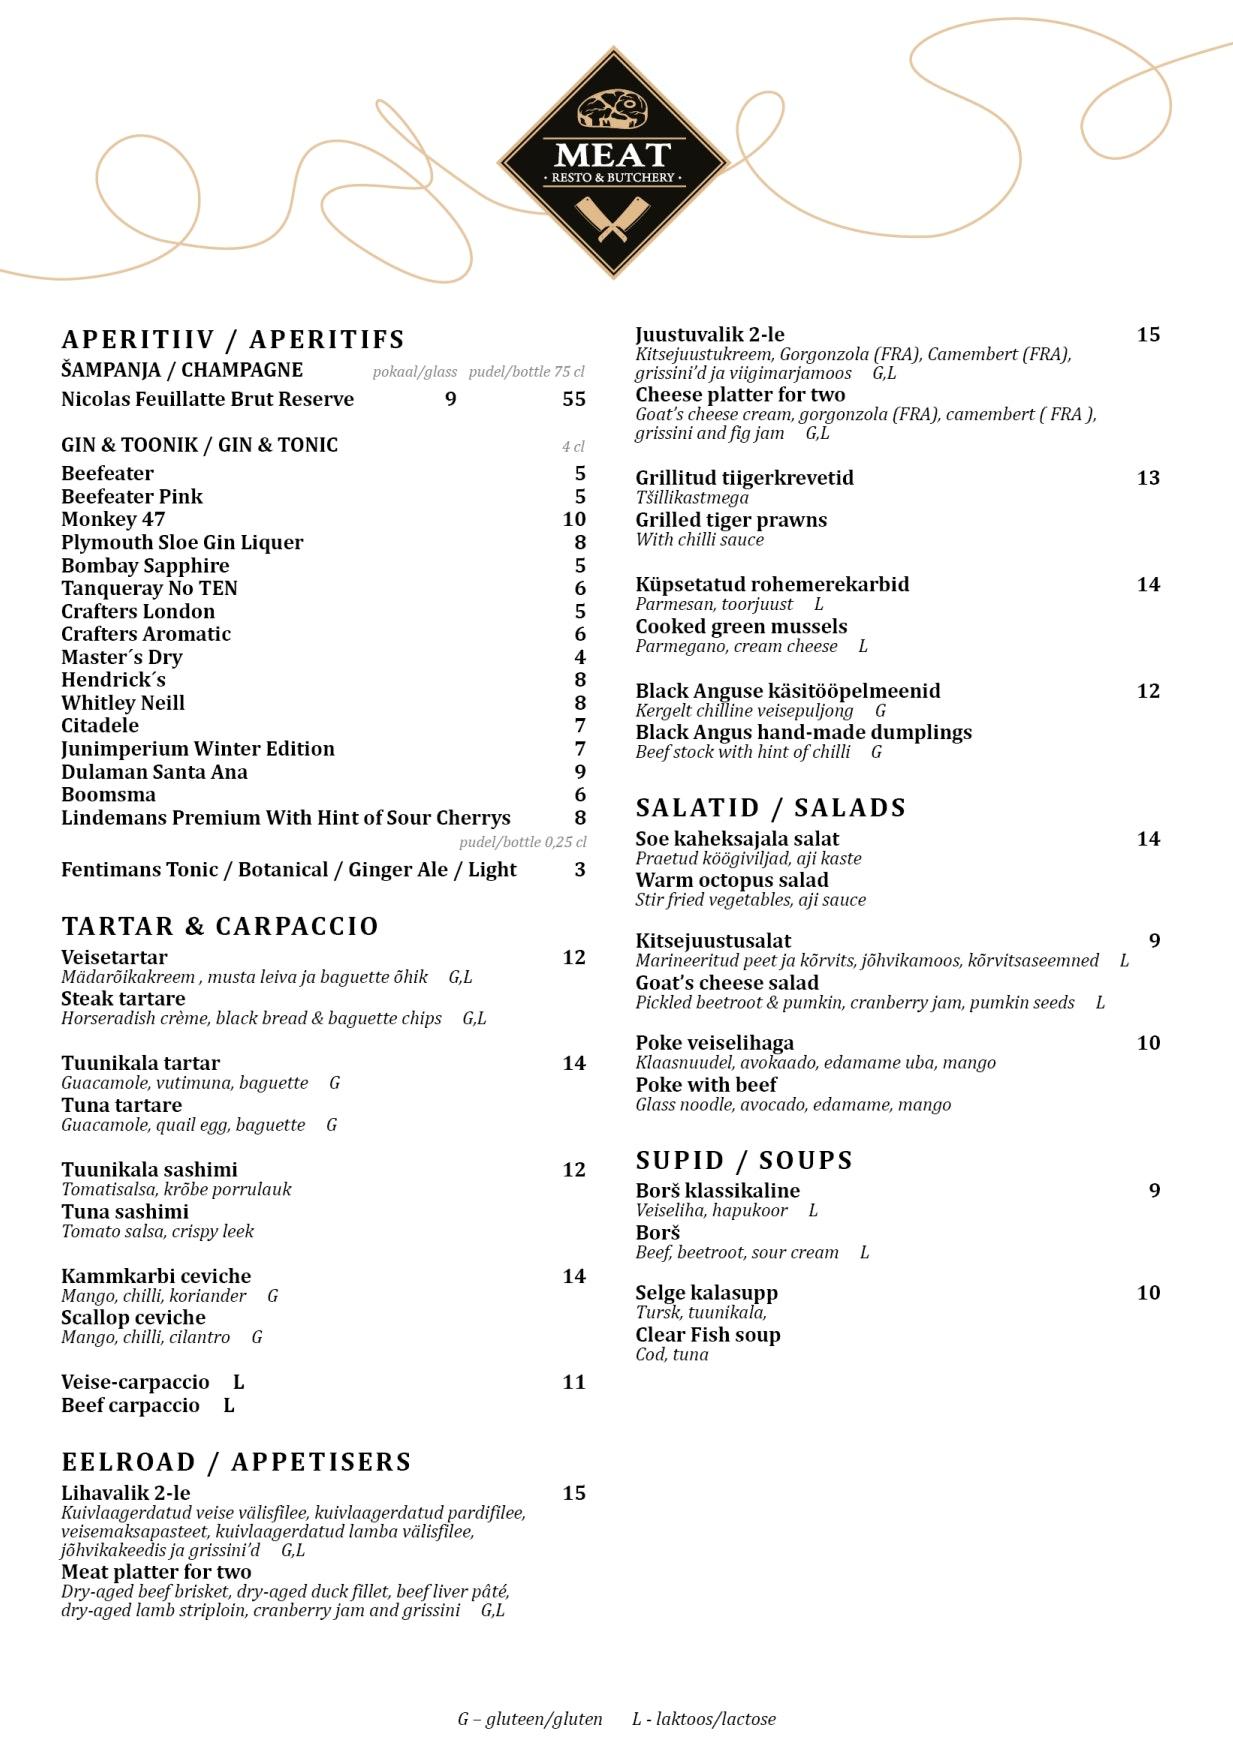 MEAT Resto & Butchery menu 2/5